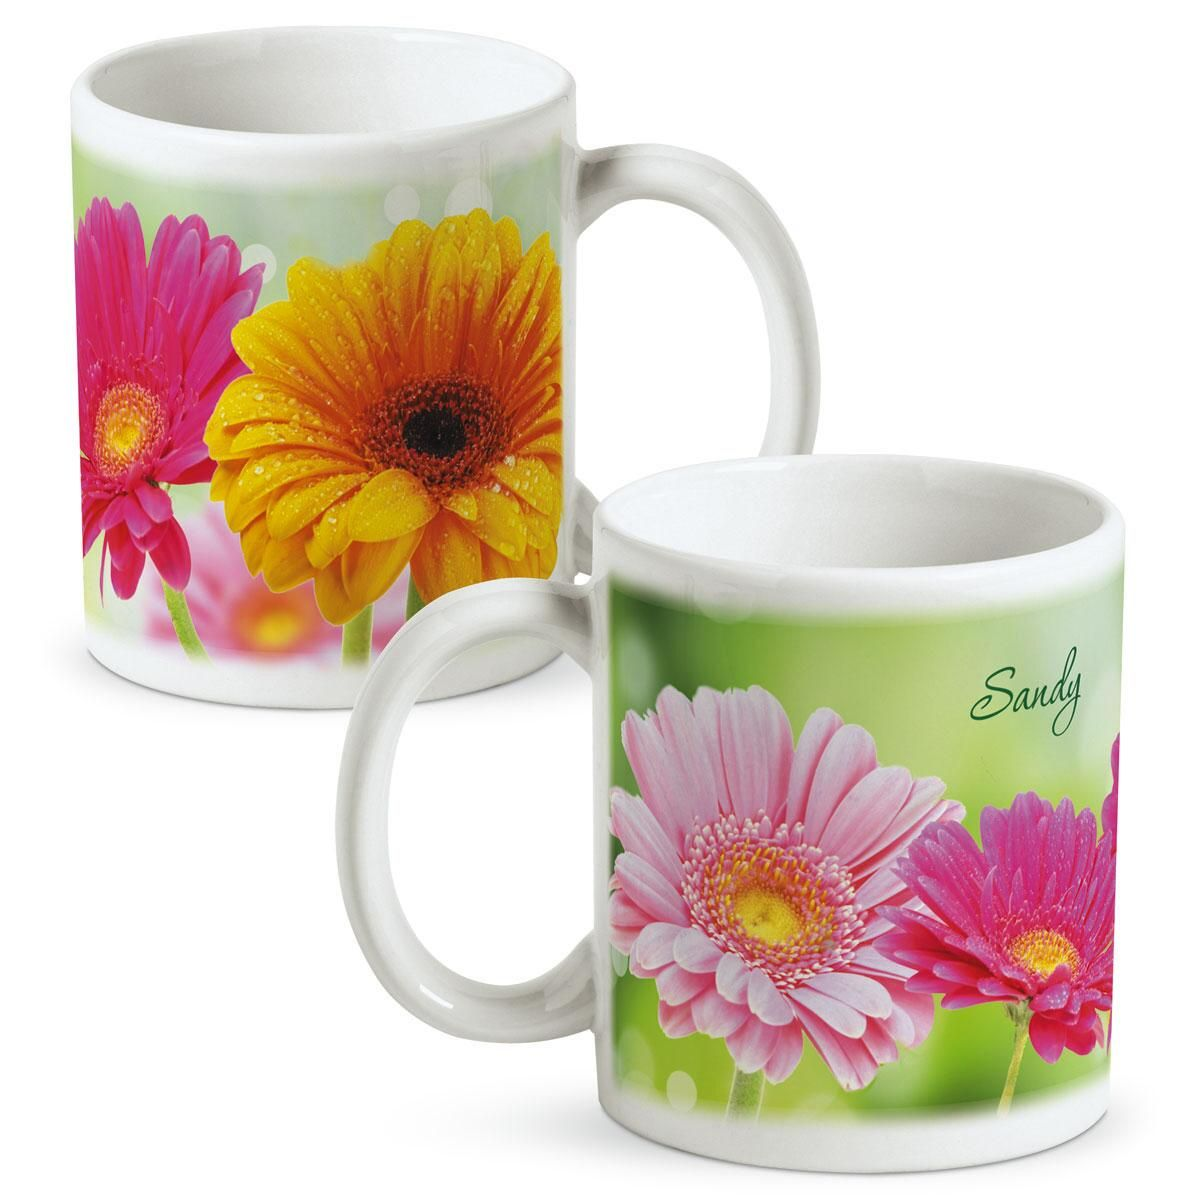 Gerbera Daisy Personalized Mug